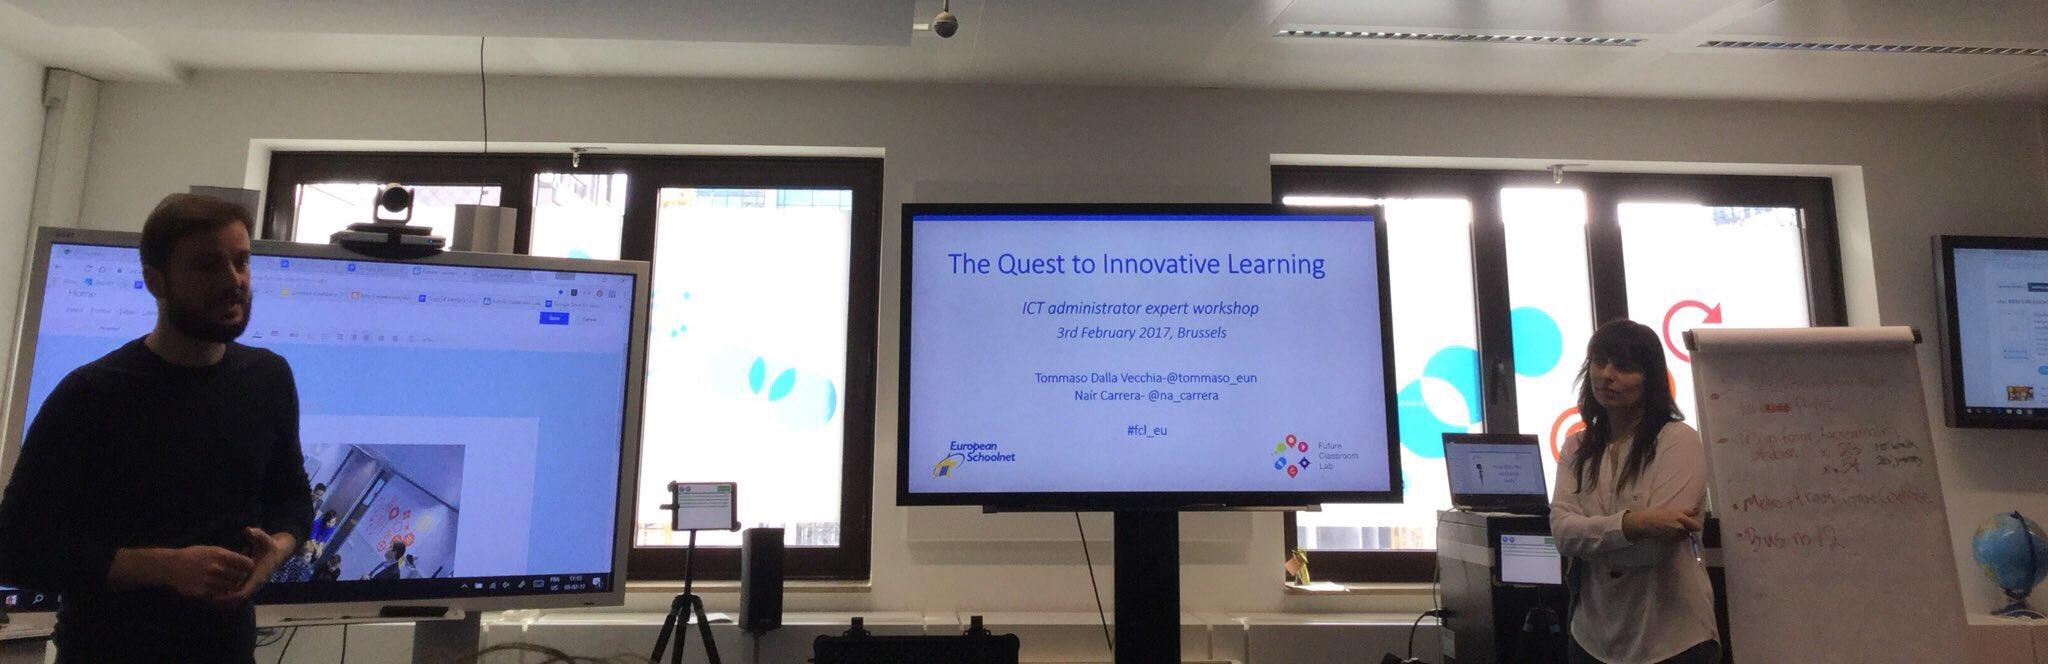 @tommaso_eun and @Na_carrera help us to explore #fcl_eun #AllSTEMScientix https://t.co/QwcB0nlavZ